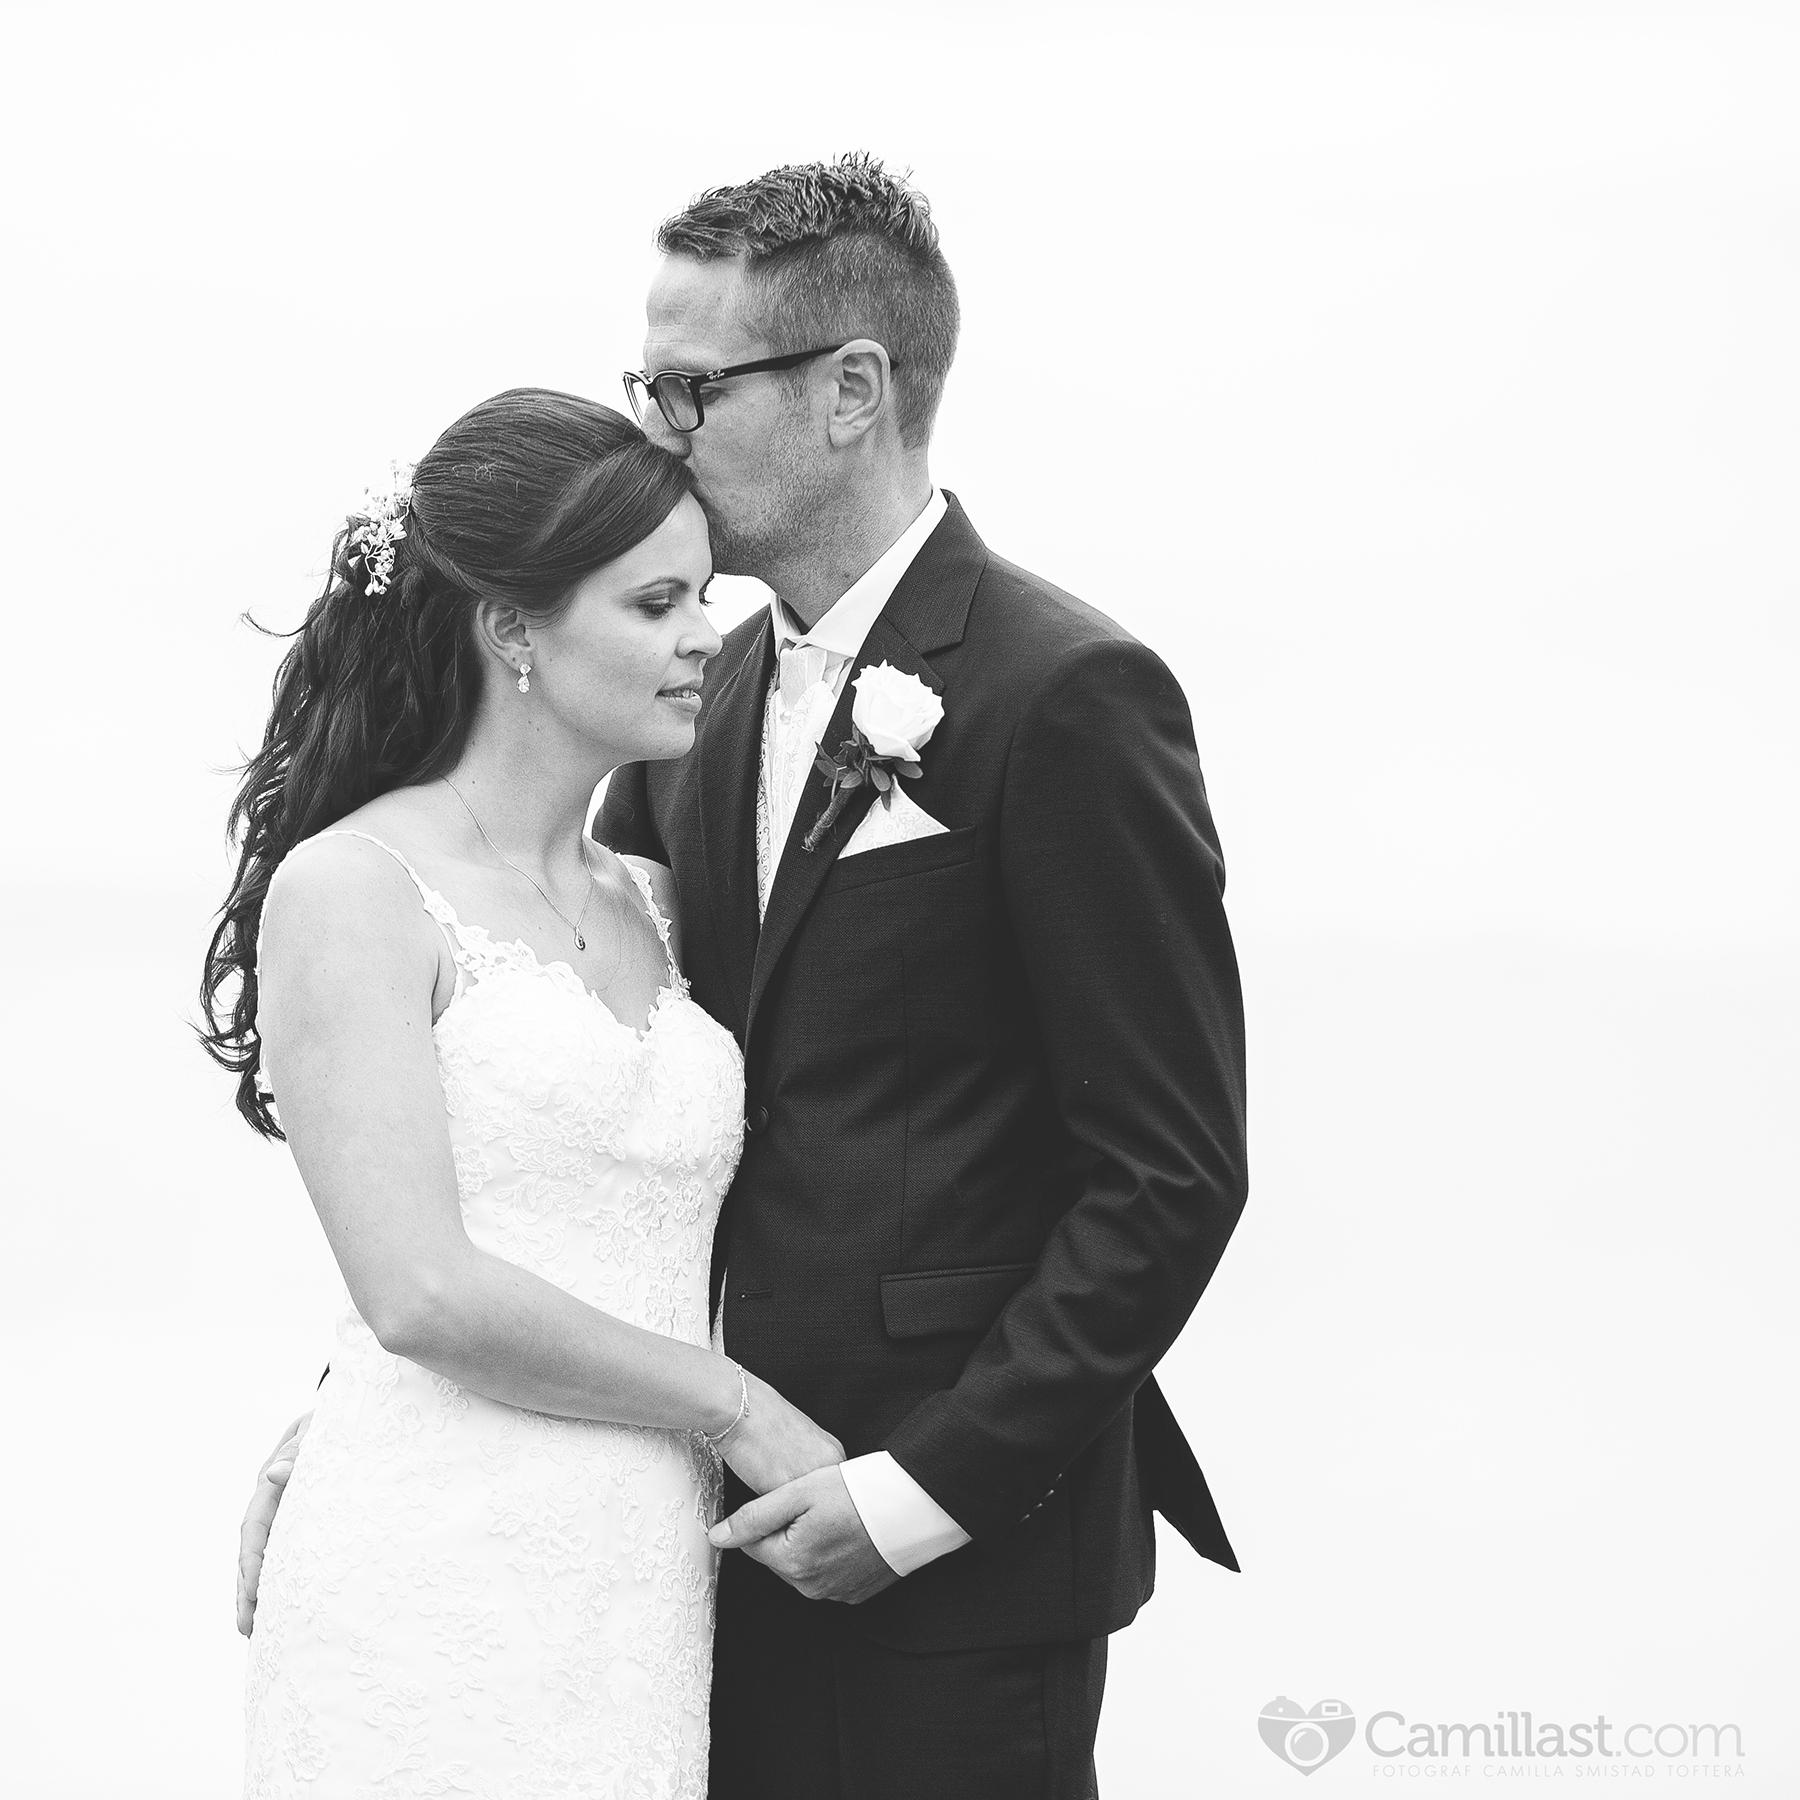 Bryllup_SH_Iselin&Espen2019_fotograf_camillasmistadtofterå__GAT8573 copy249.jpg